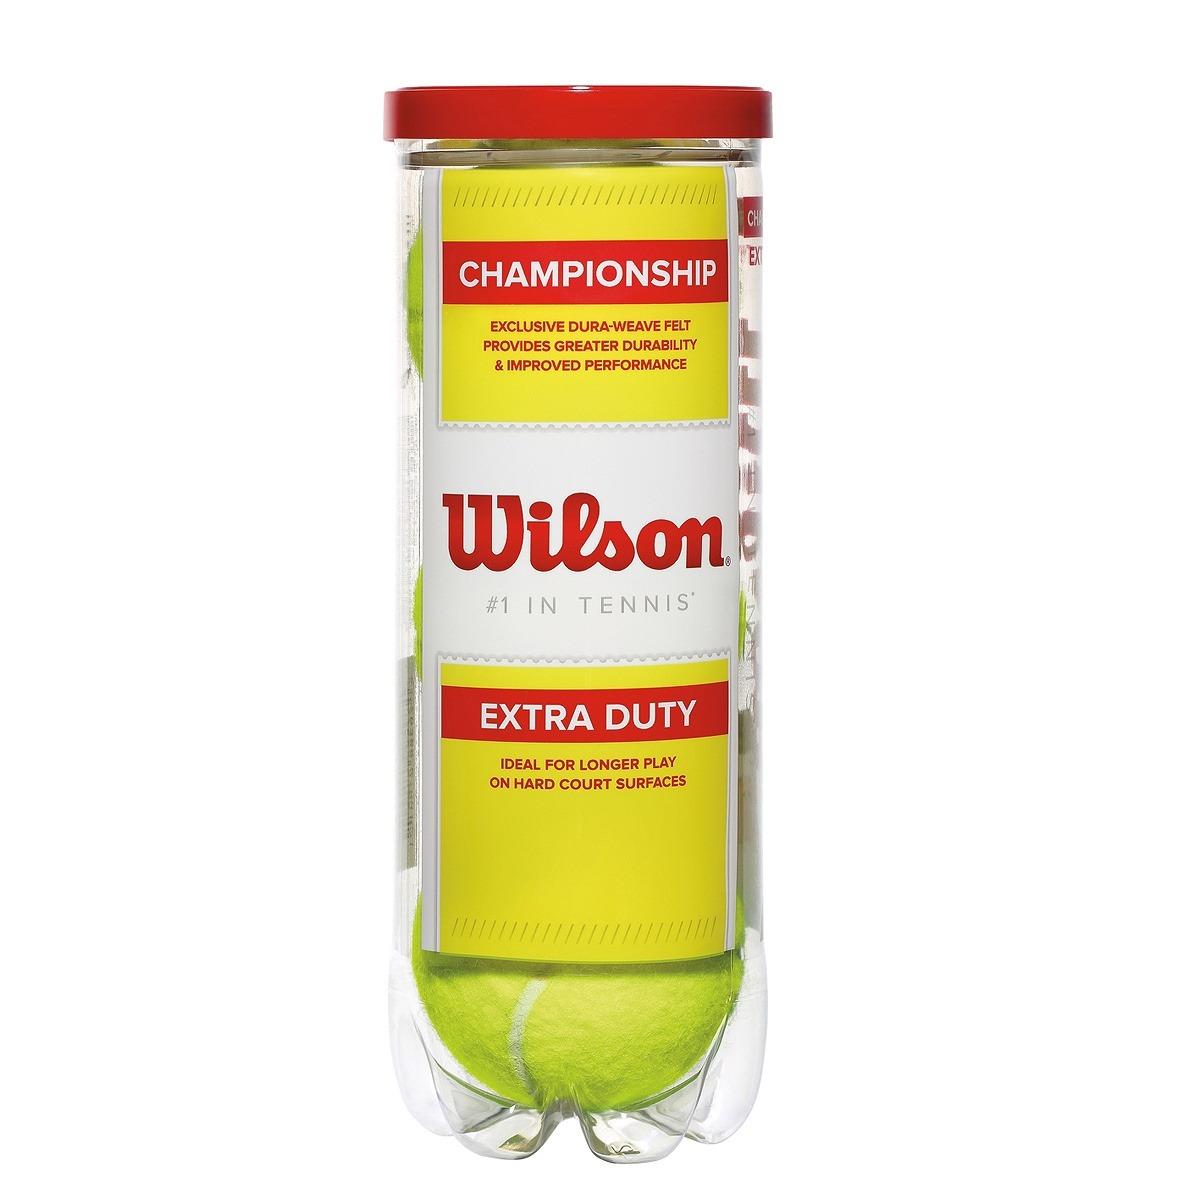 b4f7a97656 bola de tênis padel wilson championship tubo 3 bolas. Carregando zoom.